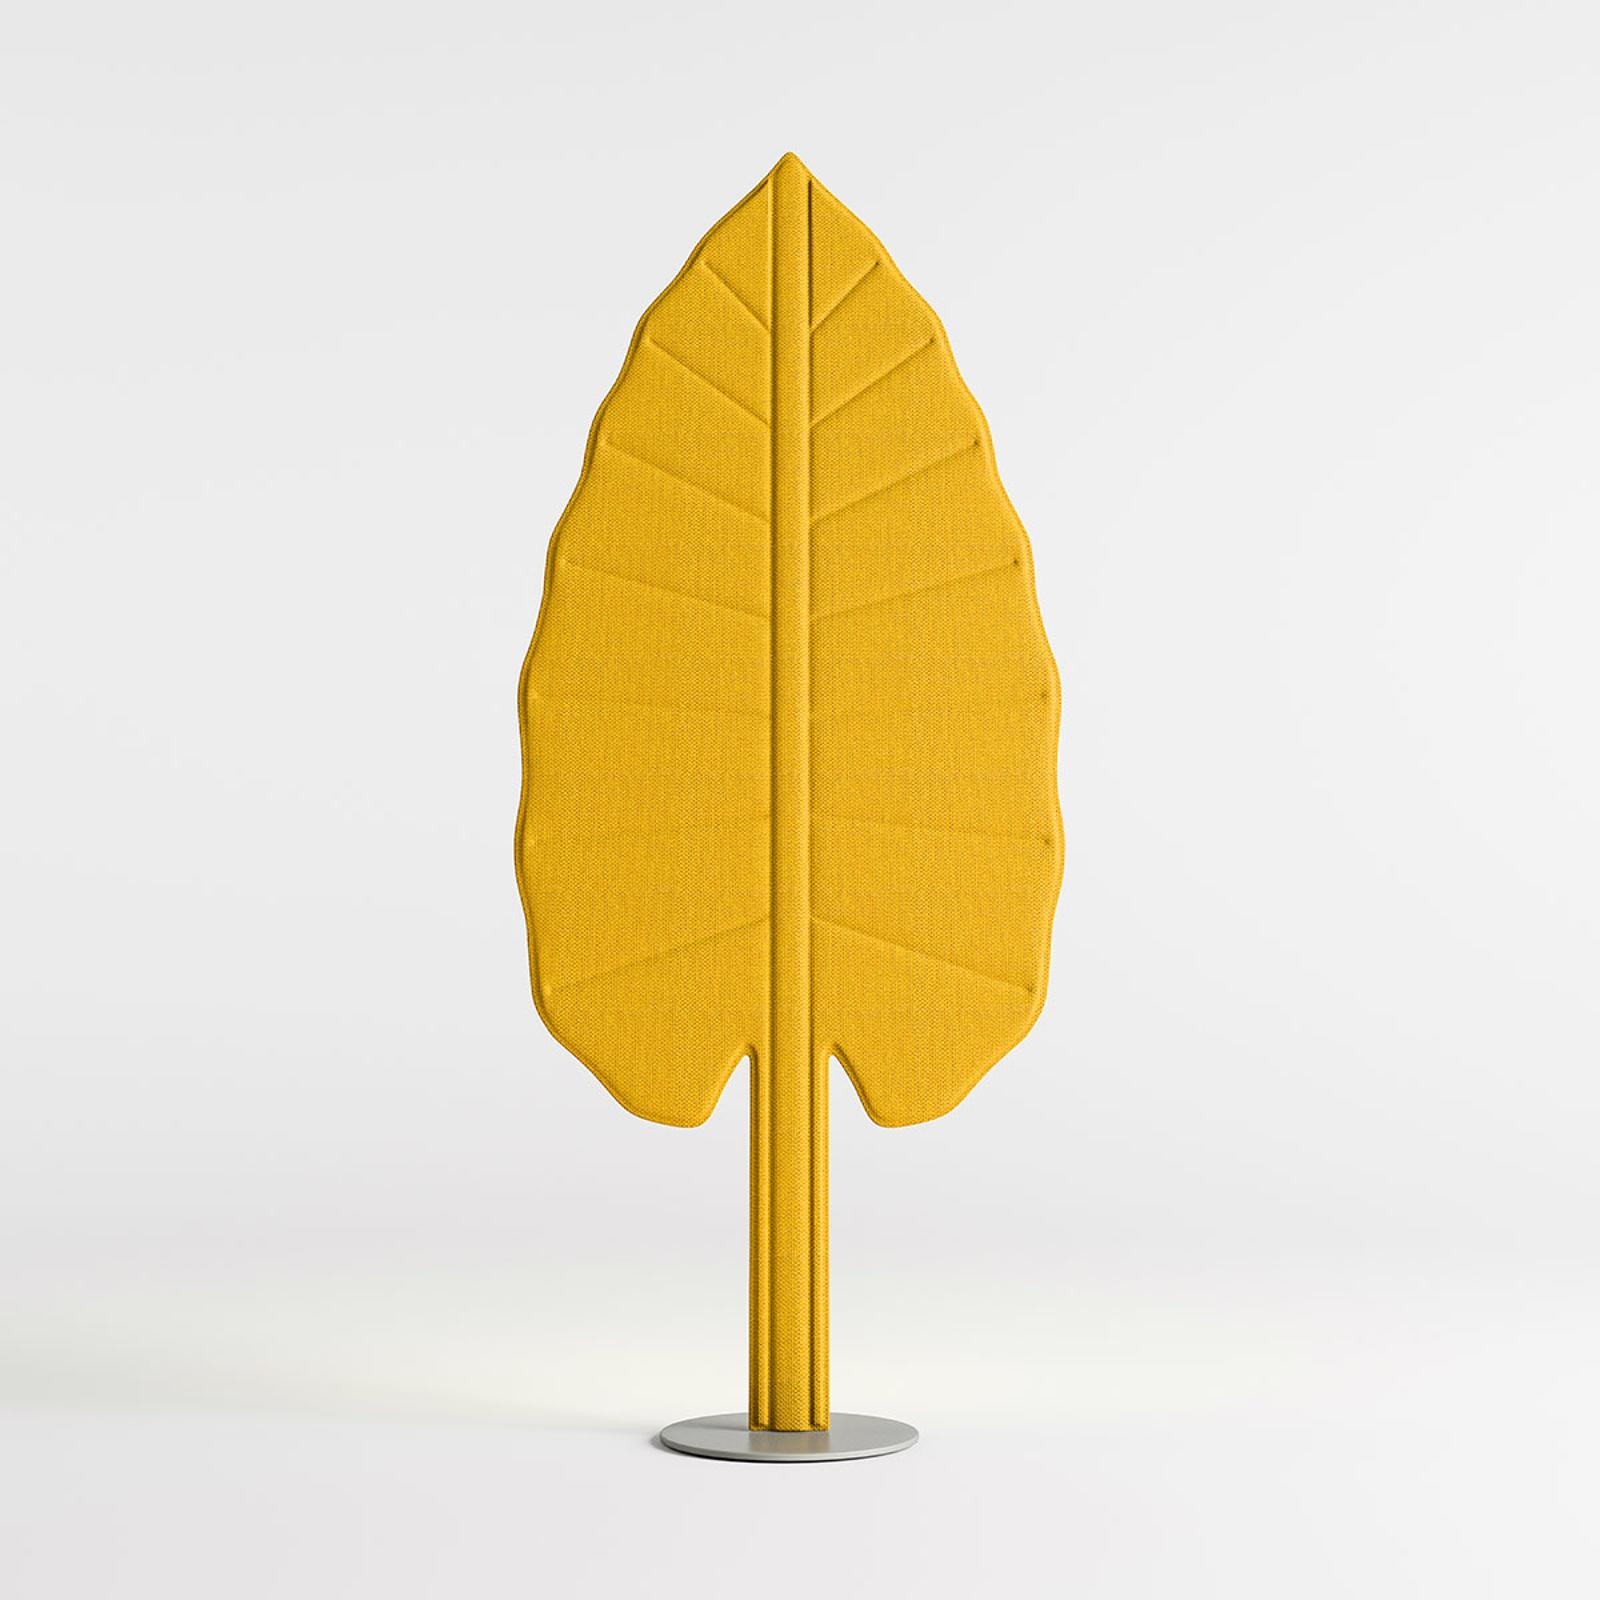 Rotaliana Eden Alocasia LED-Stehleuchte, gelb